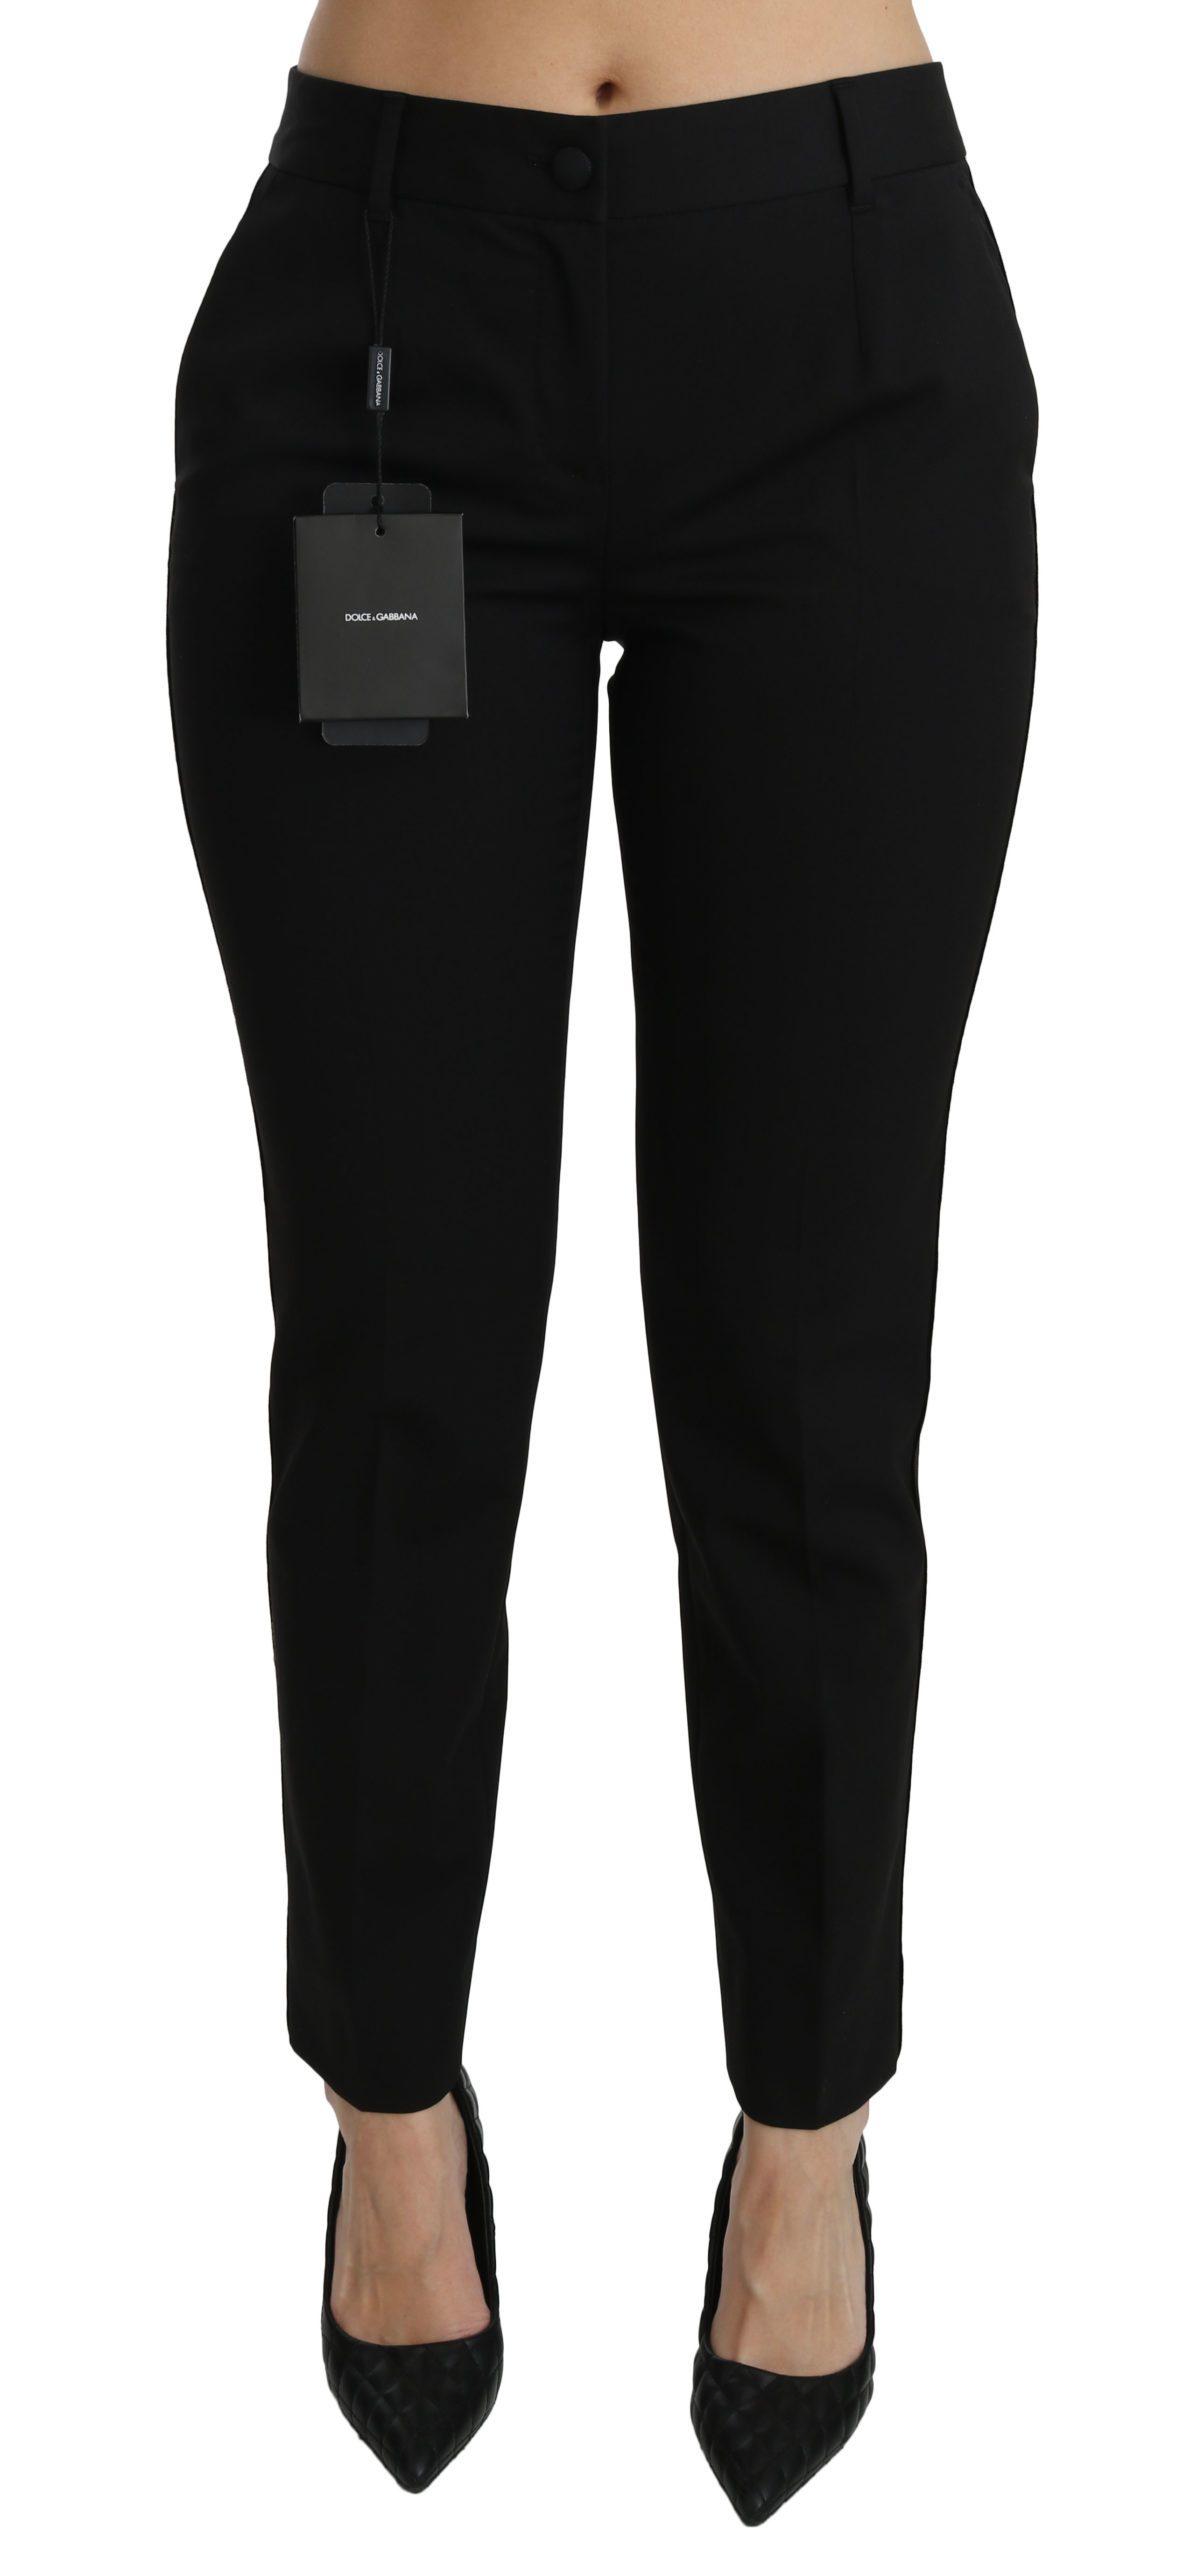 Dolce & Gabbana Women's Mid Waist Skinny Formal Trouser Black PAN70860 - IT40 S